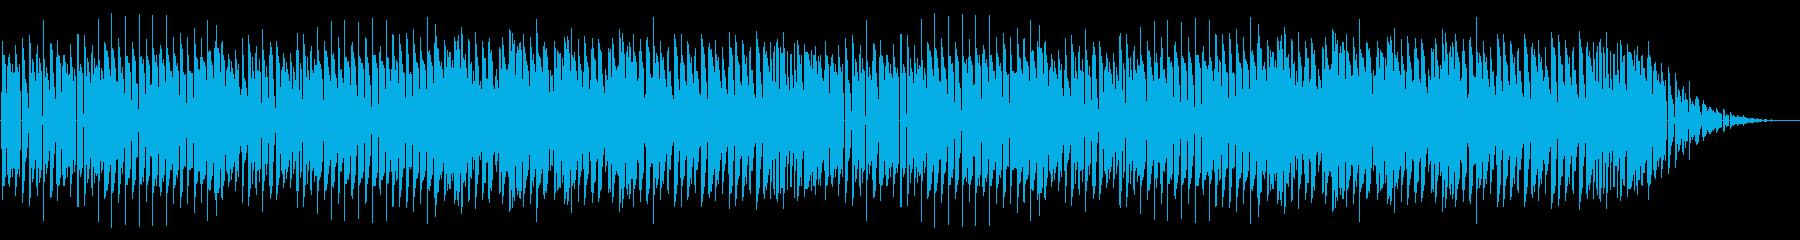 NES アクションD06-1(ステージ5の再生済みの波形